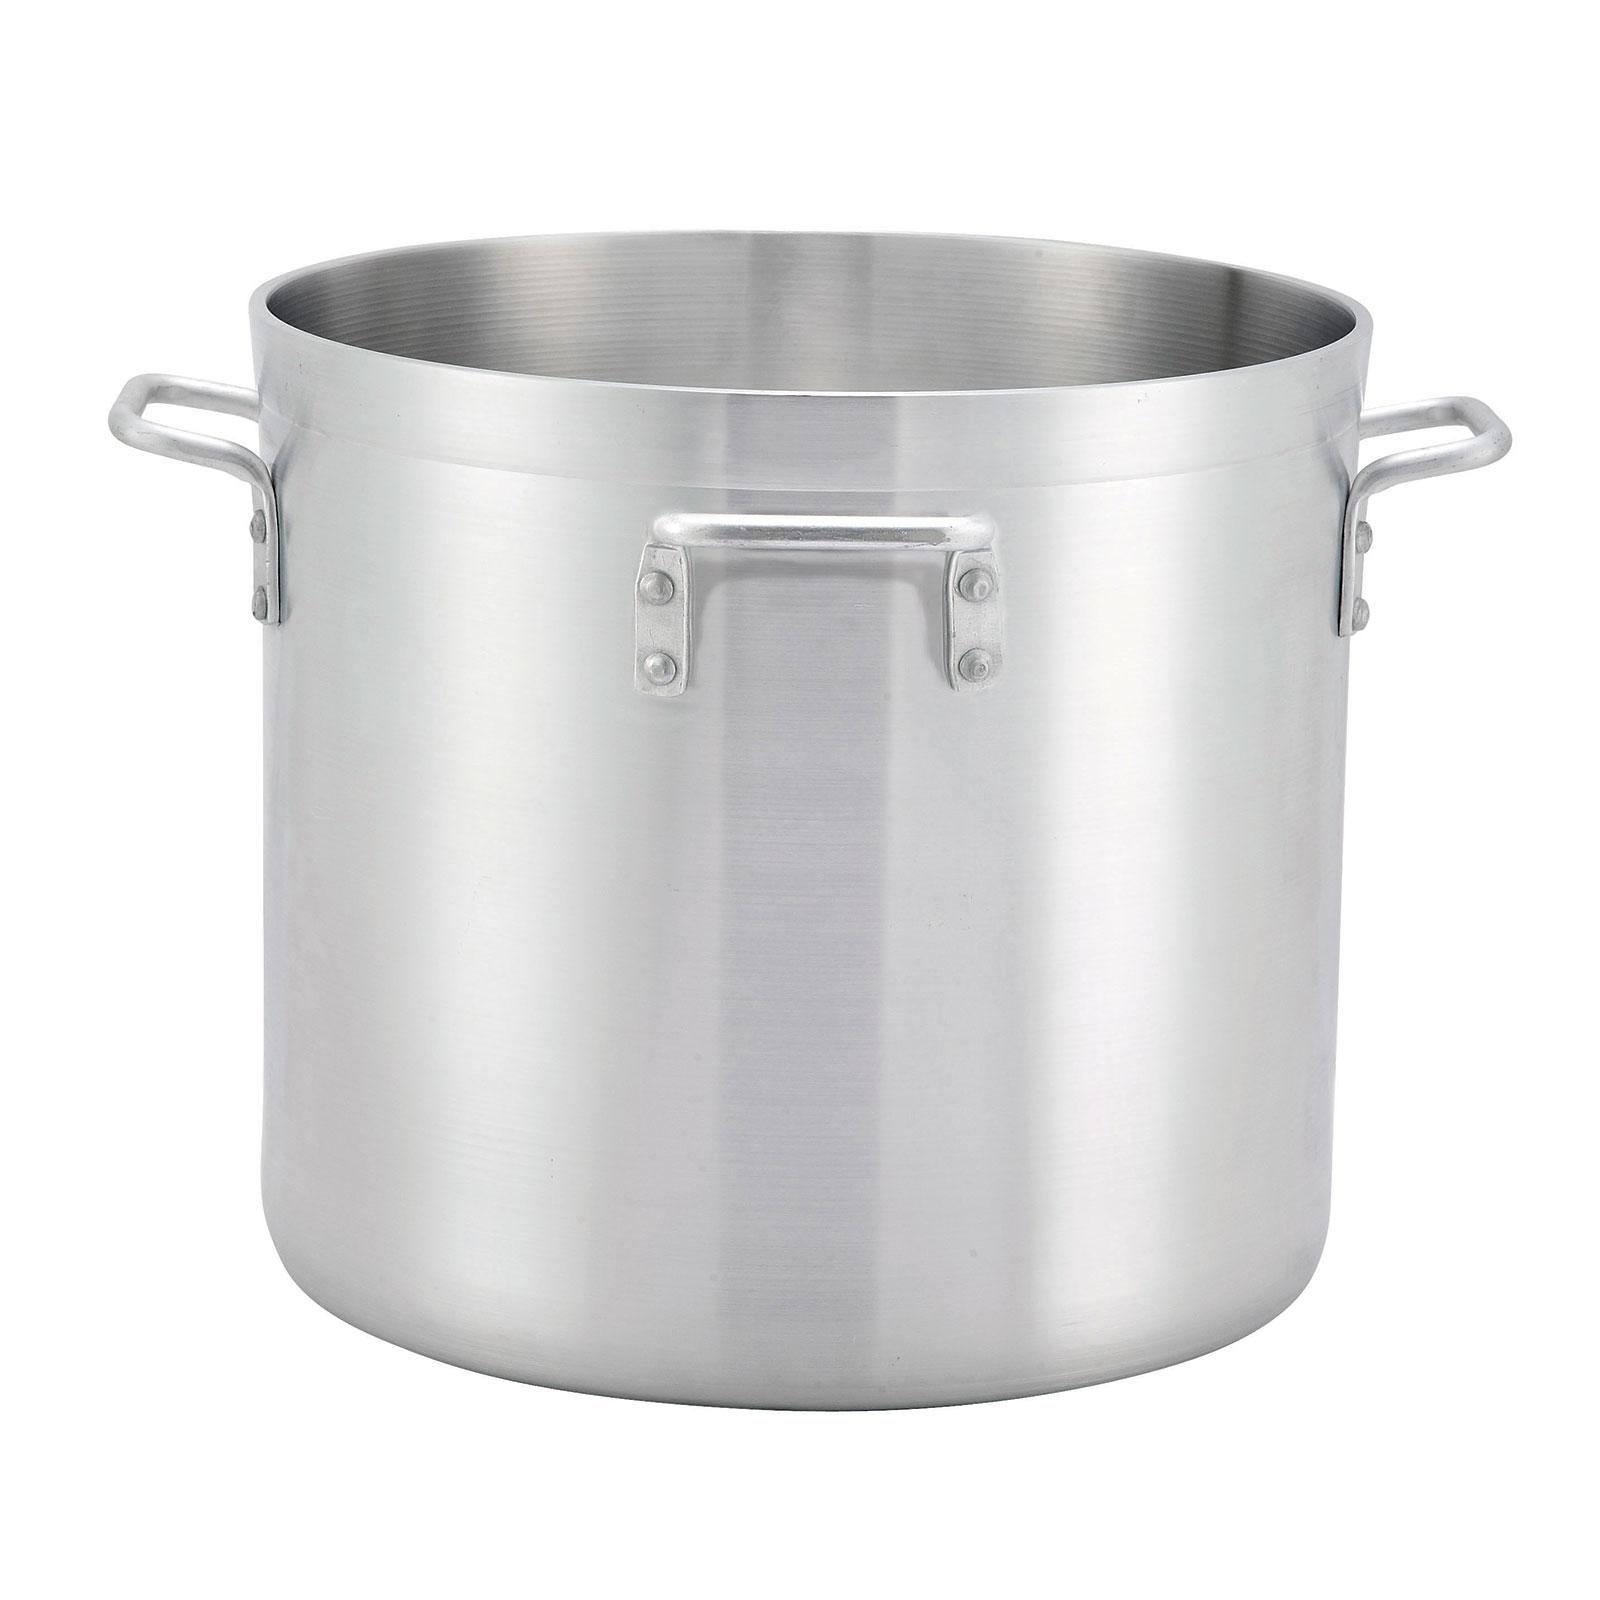 Winco ALHP-120H stock pot